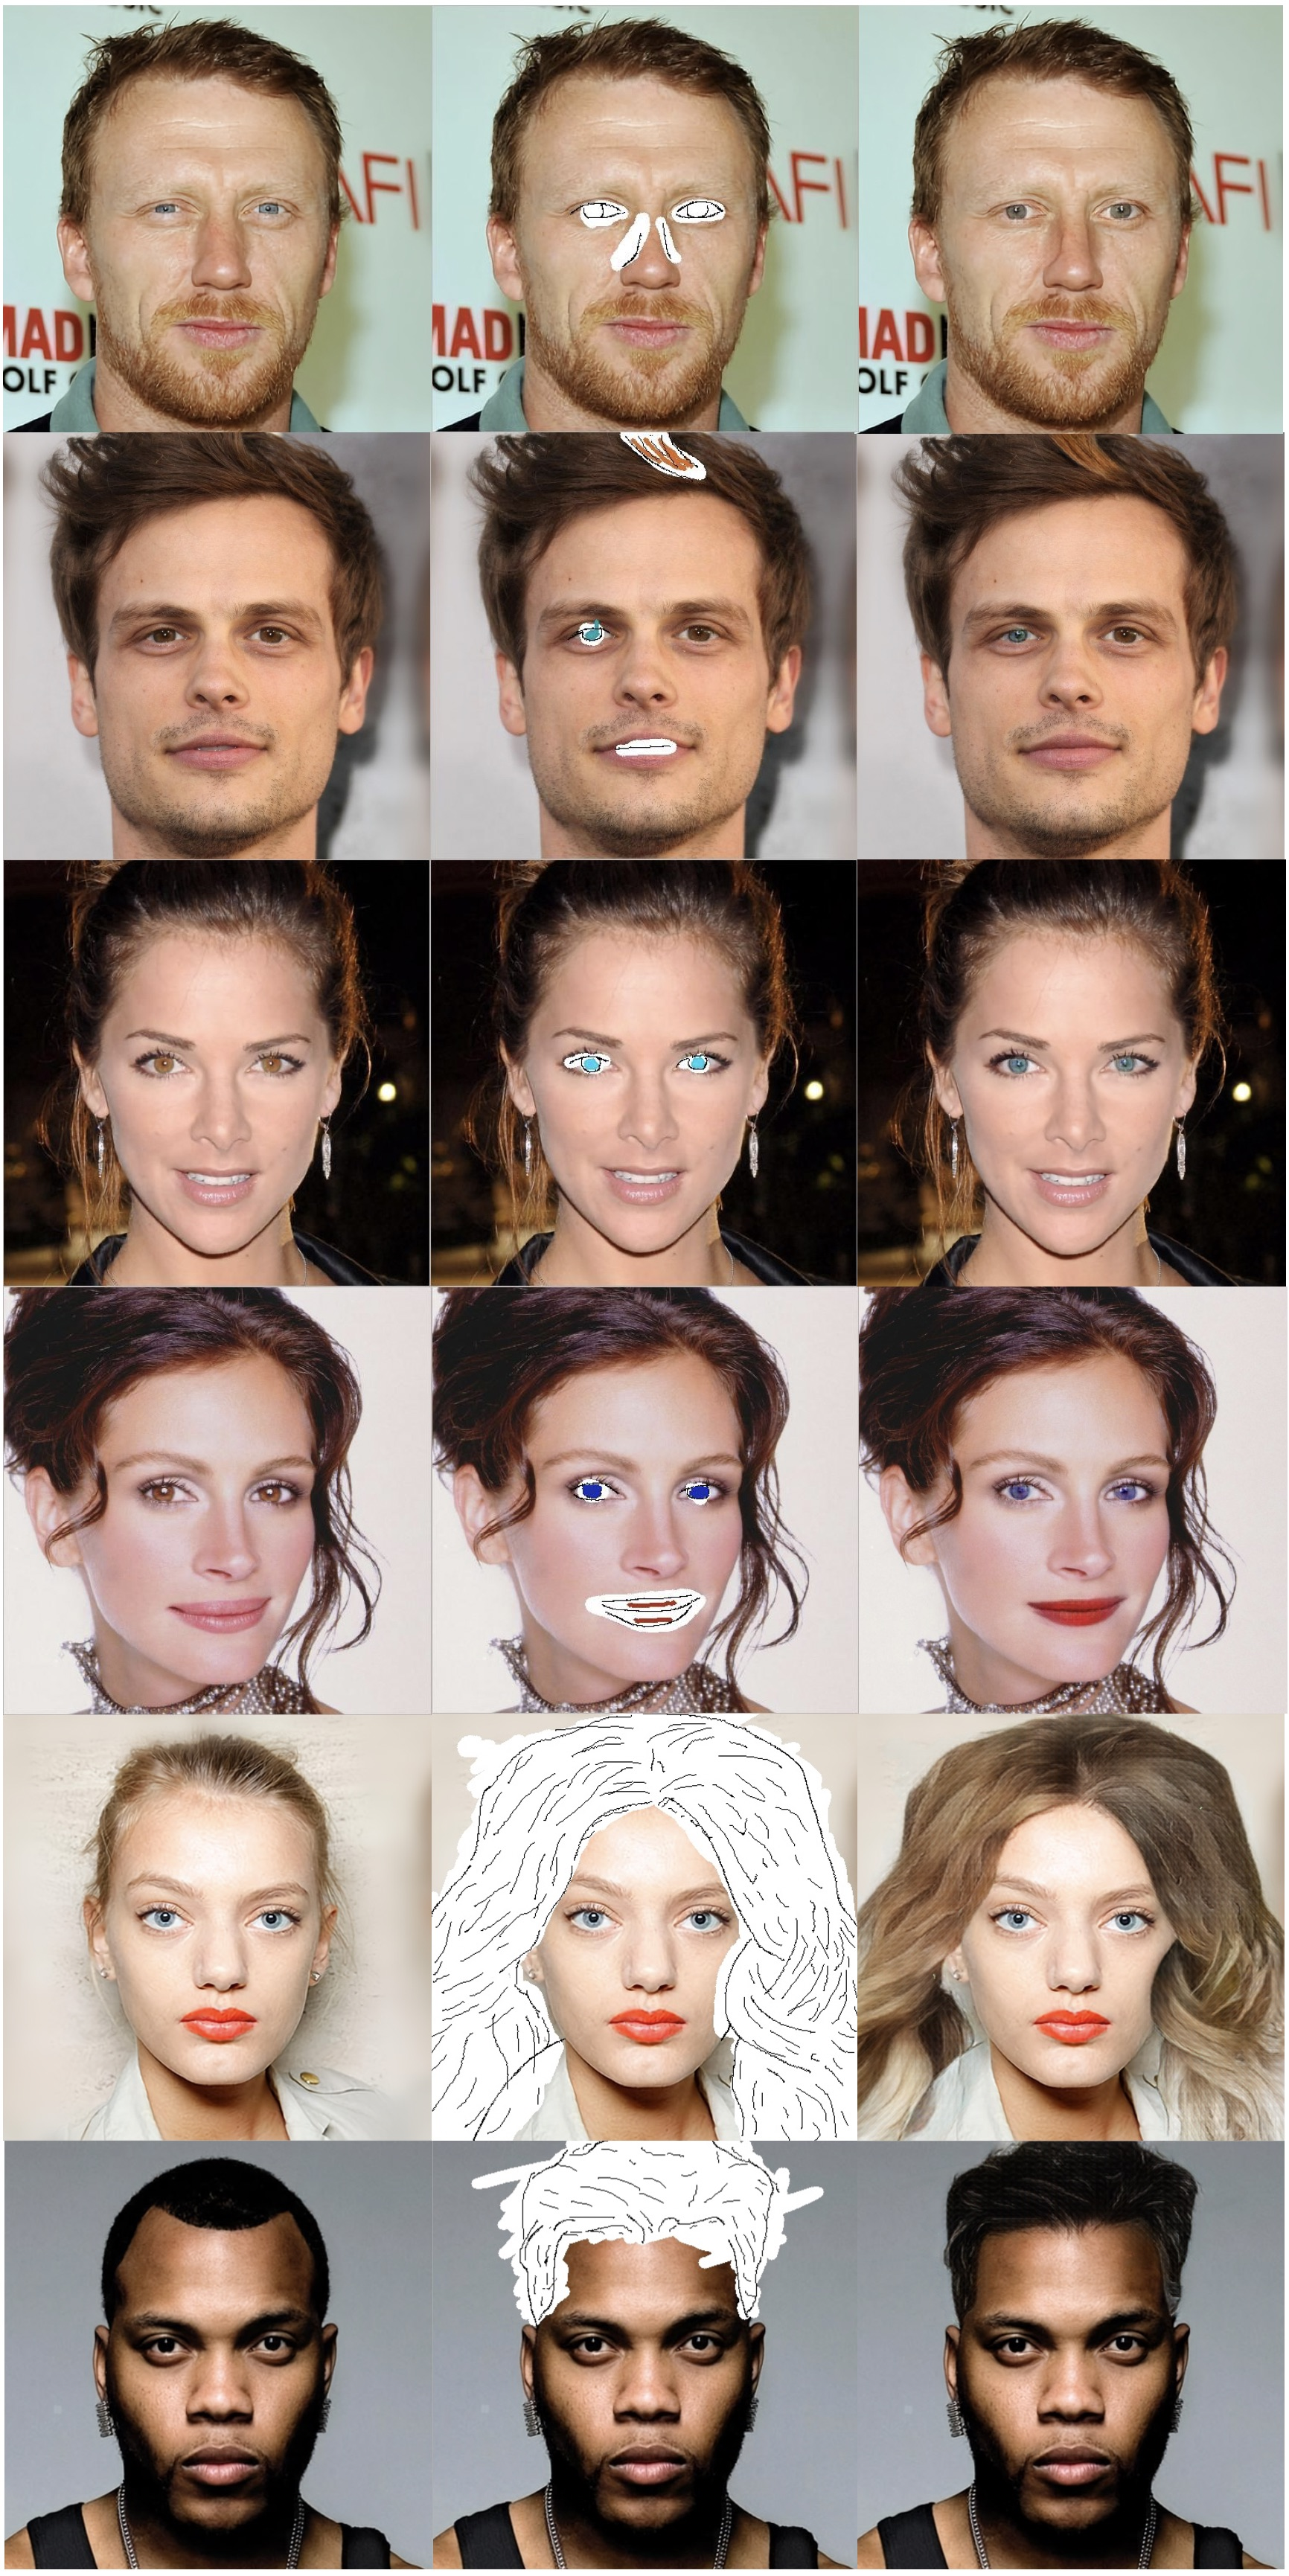 Face editing